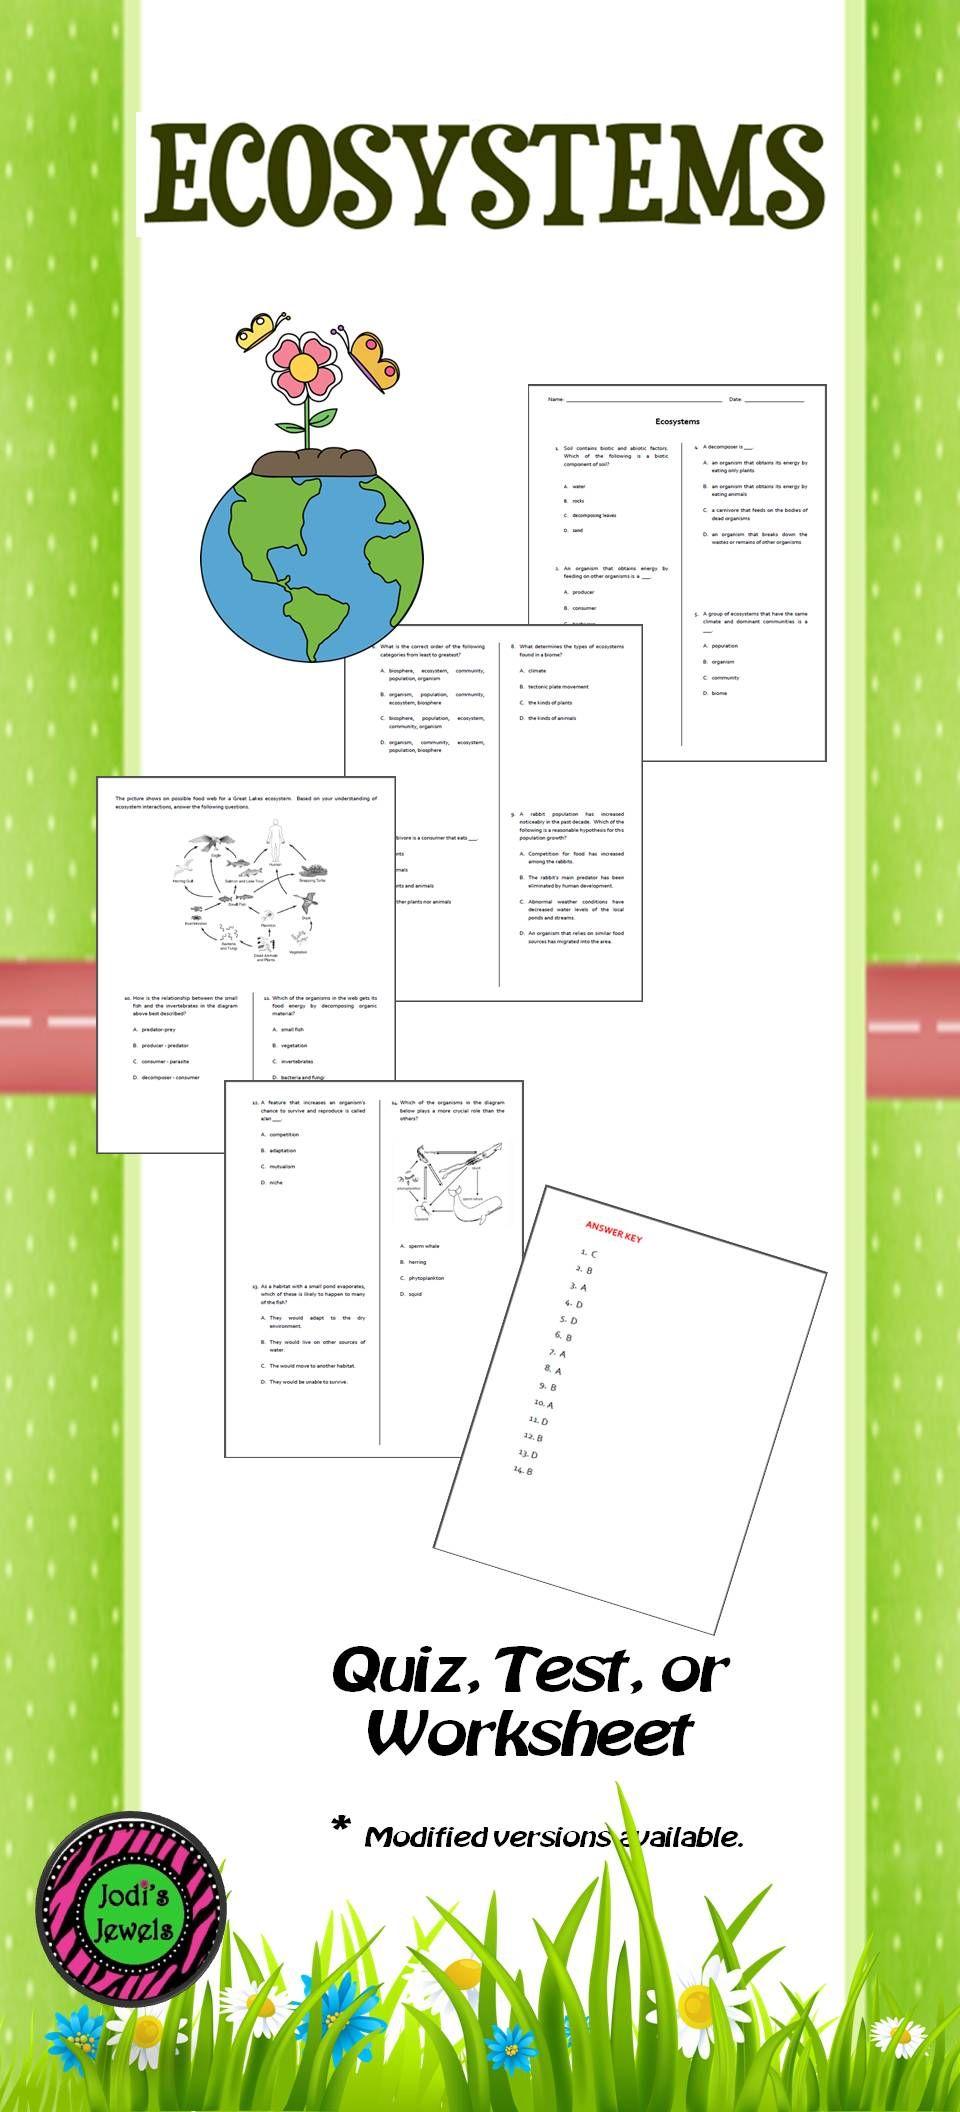 Ecosystems Quiz, Test or WS